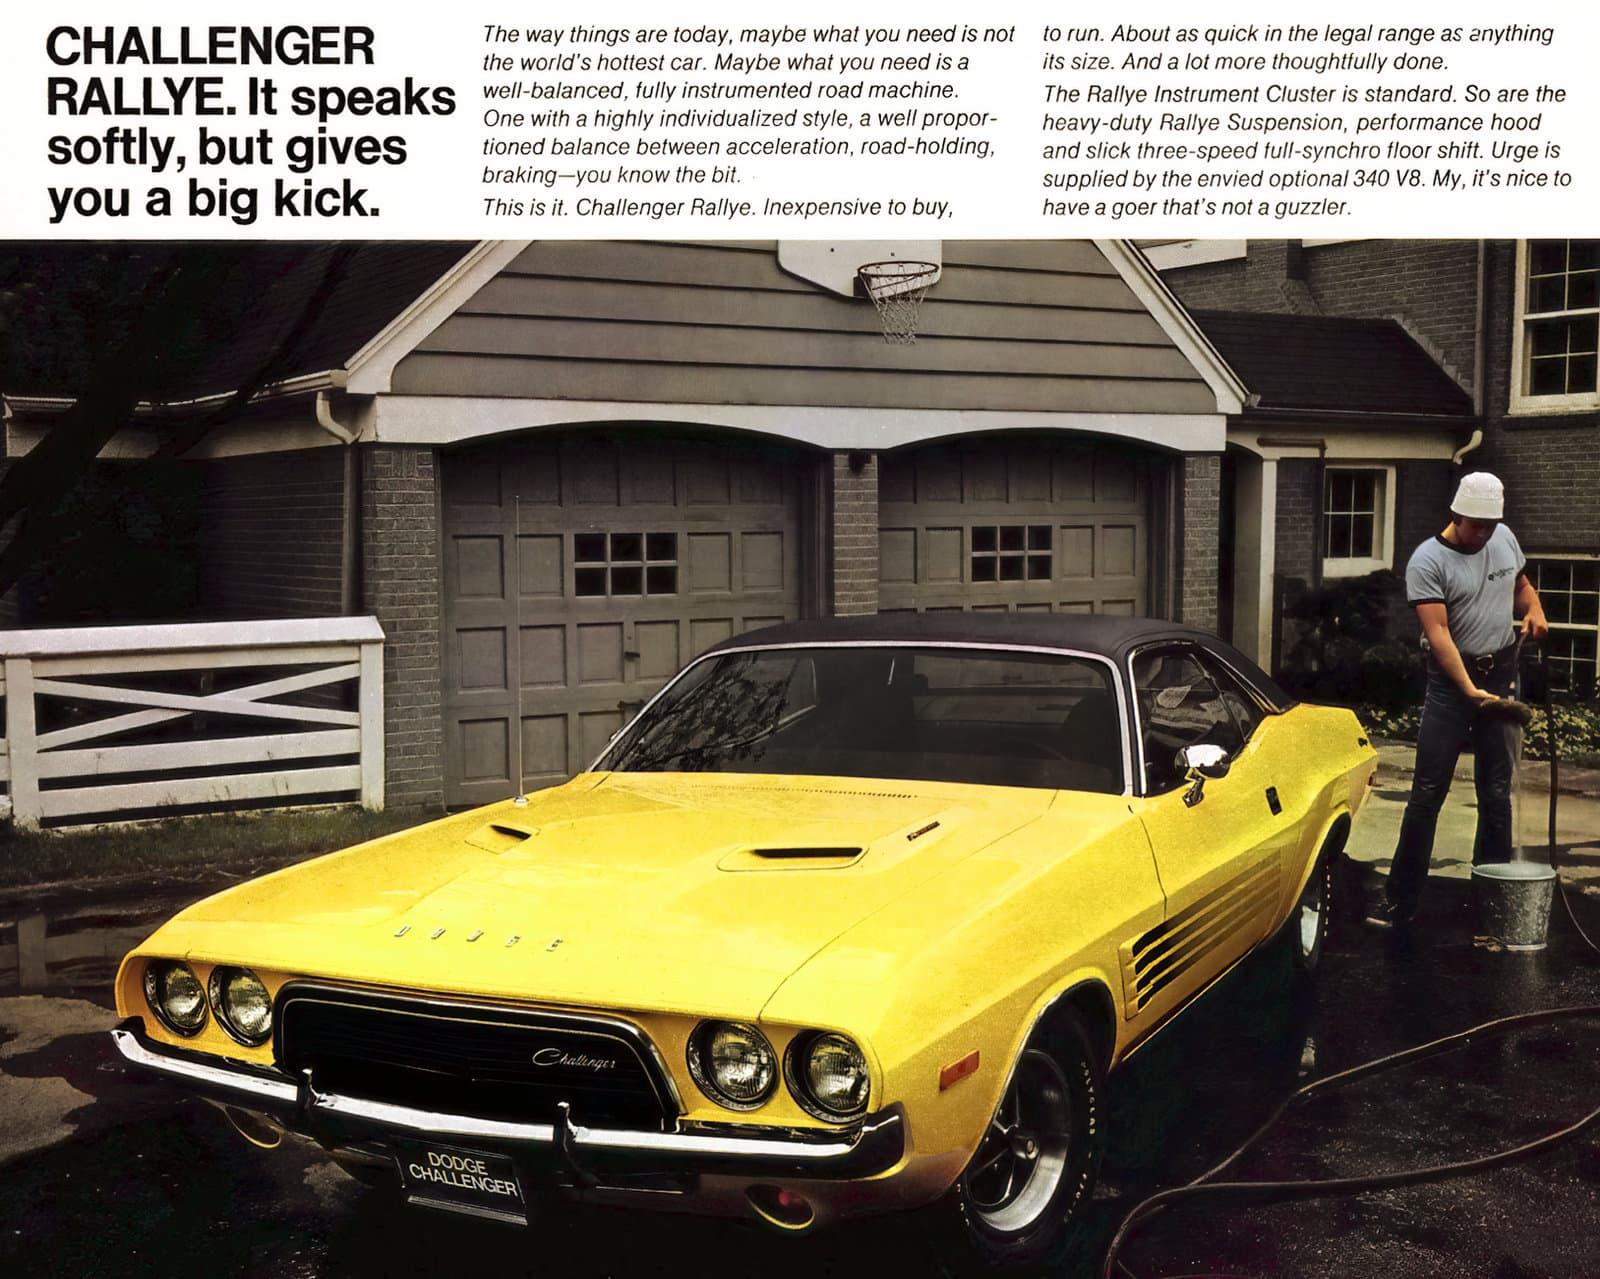 1970 Dodge Challenger Rallye in yellow